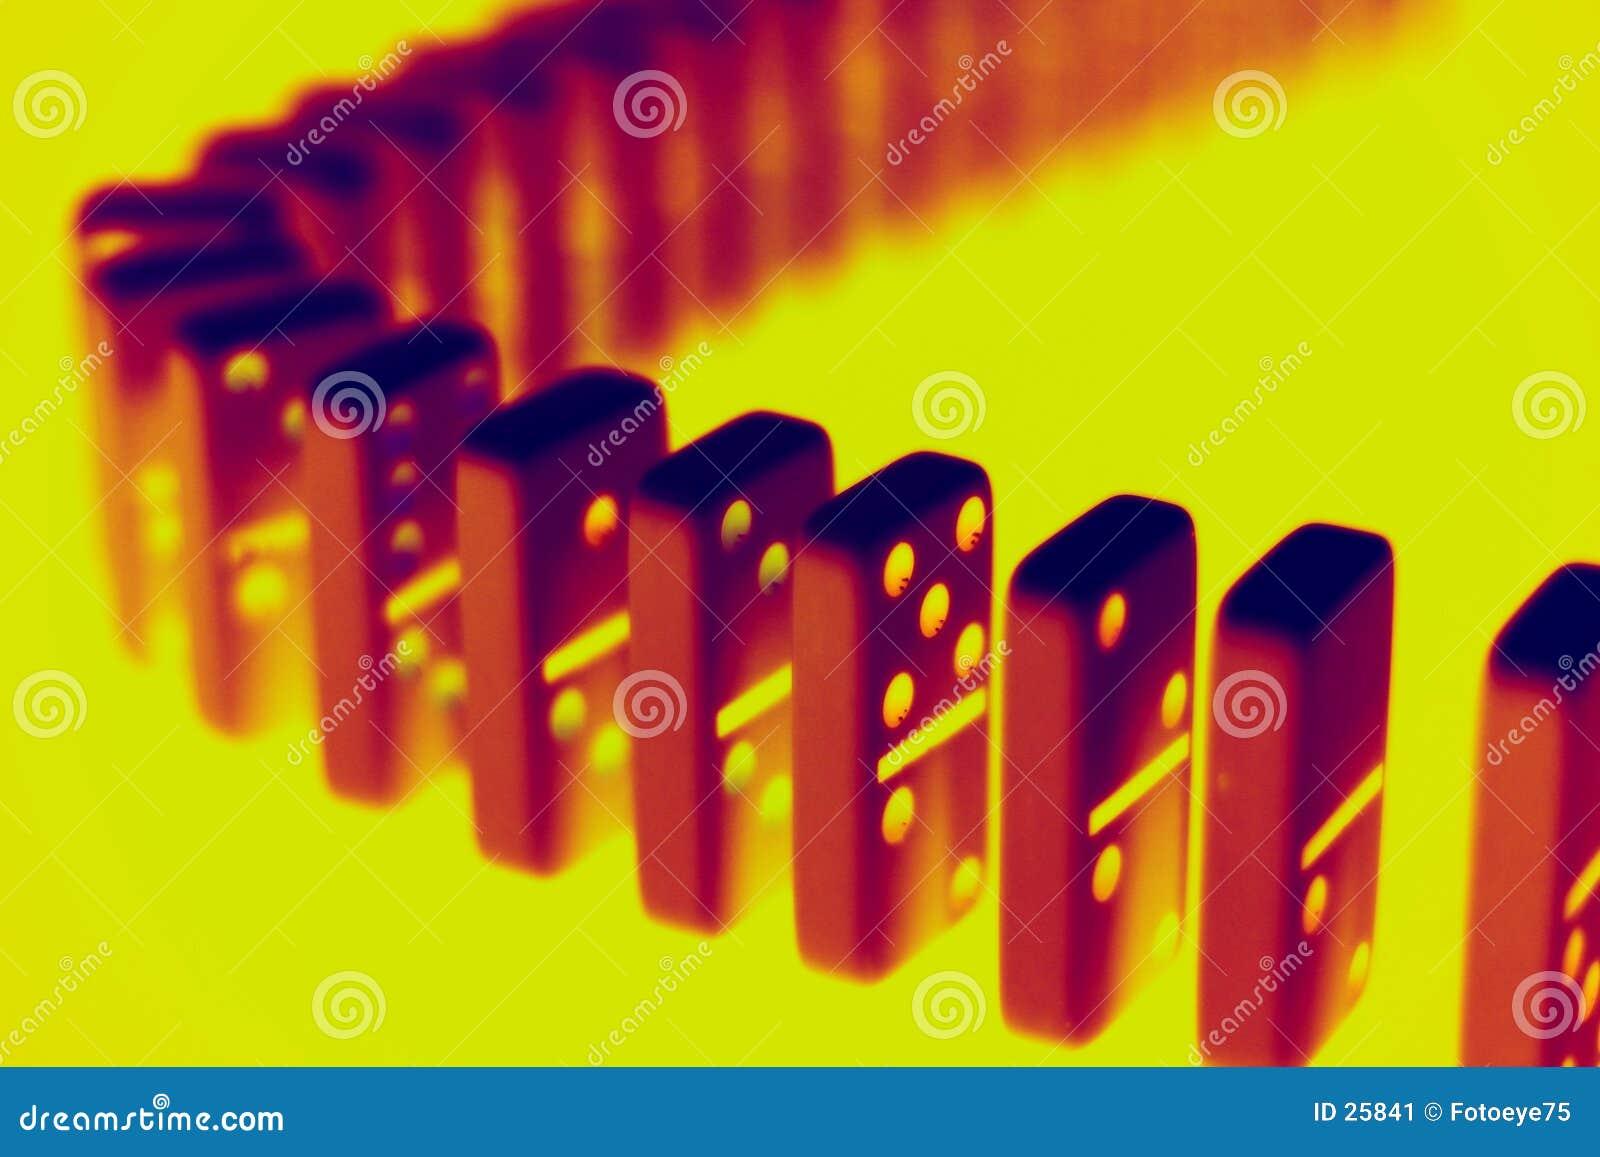 Radioactive dominoes